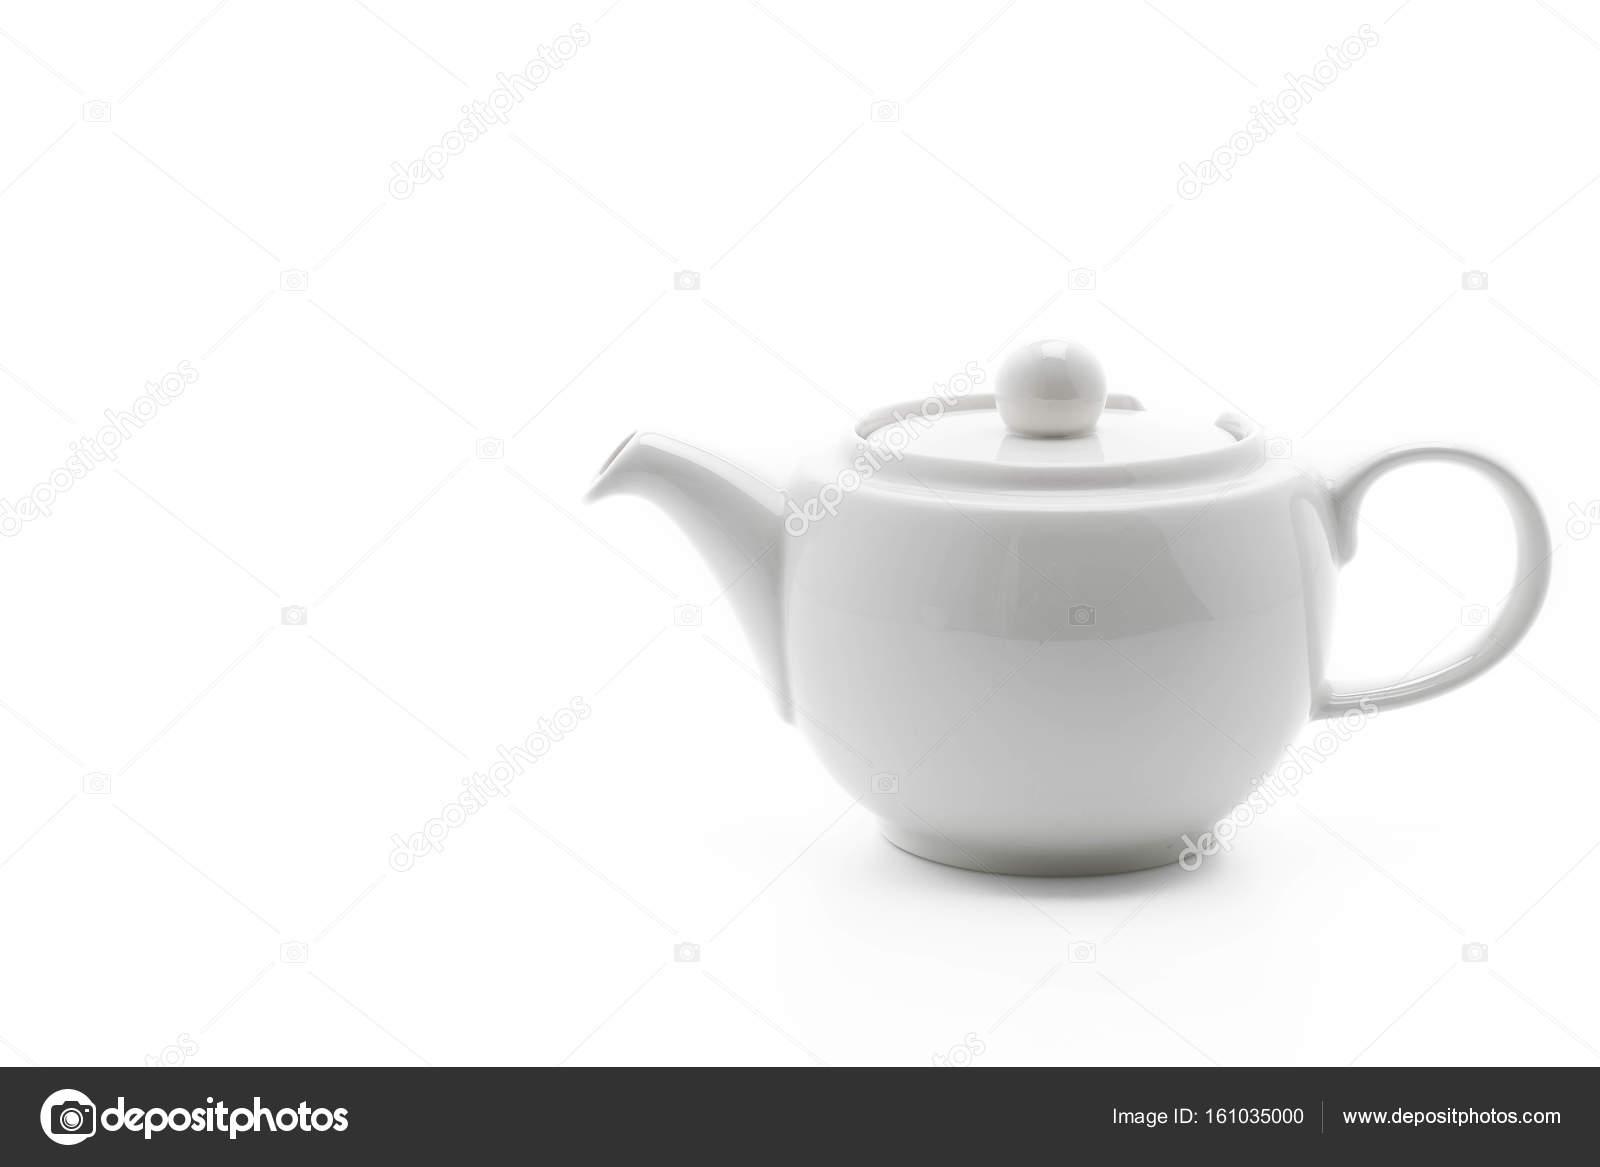 Weiße Teekanne weiße teekanne stockfoto topntp 161035000